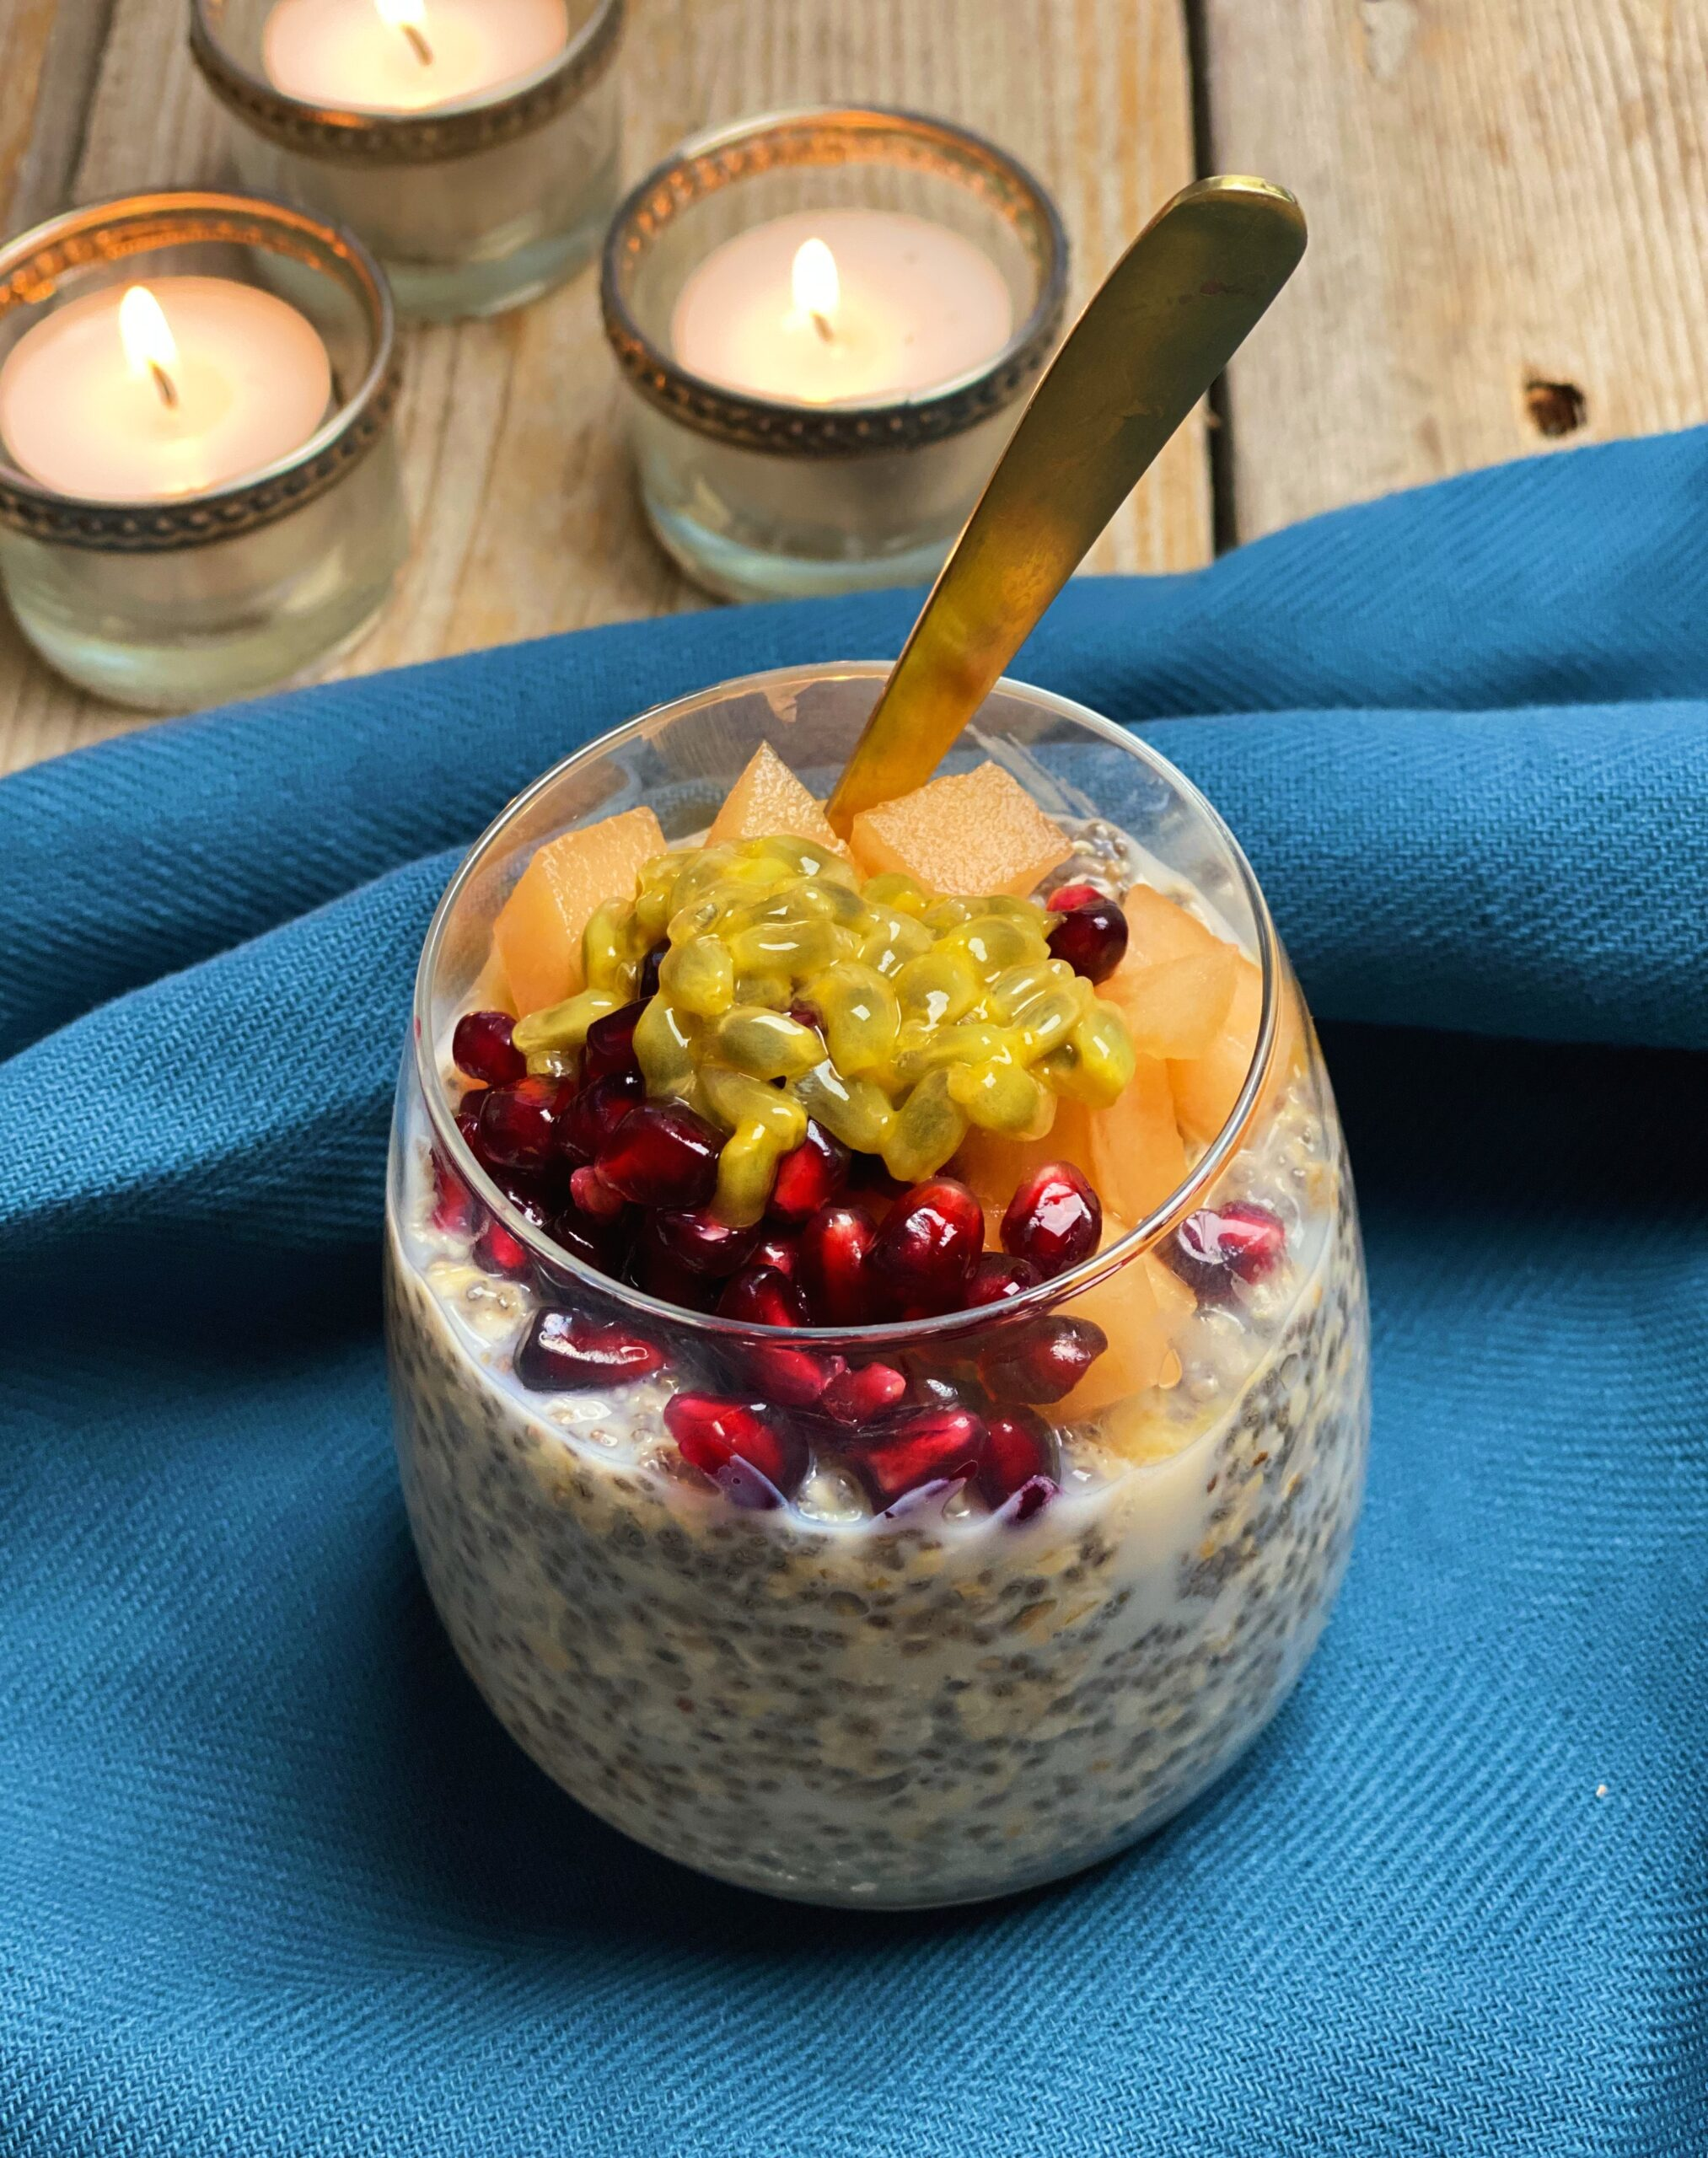 Overnight chiagrød med havregryn toppet med frisk frugt